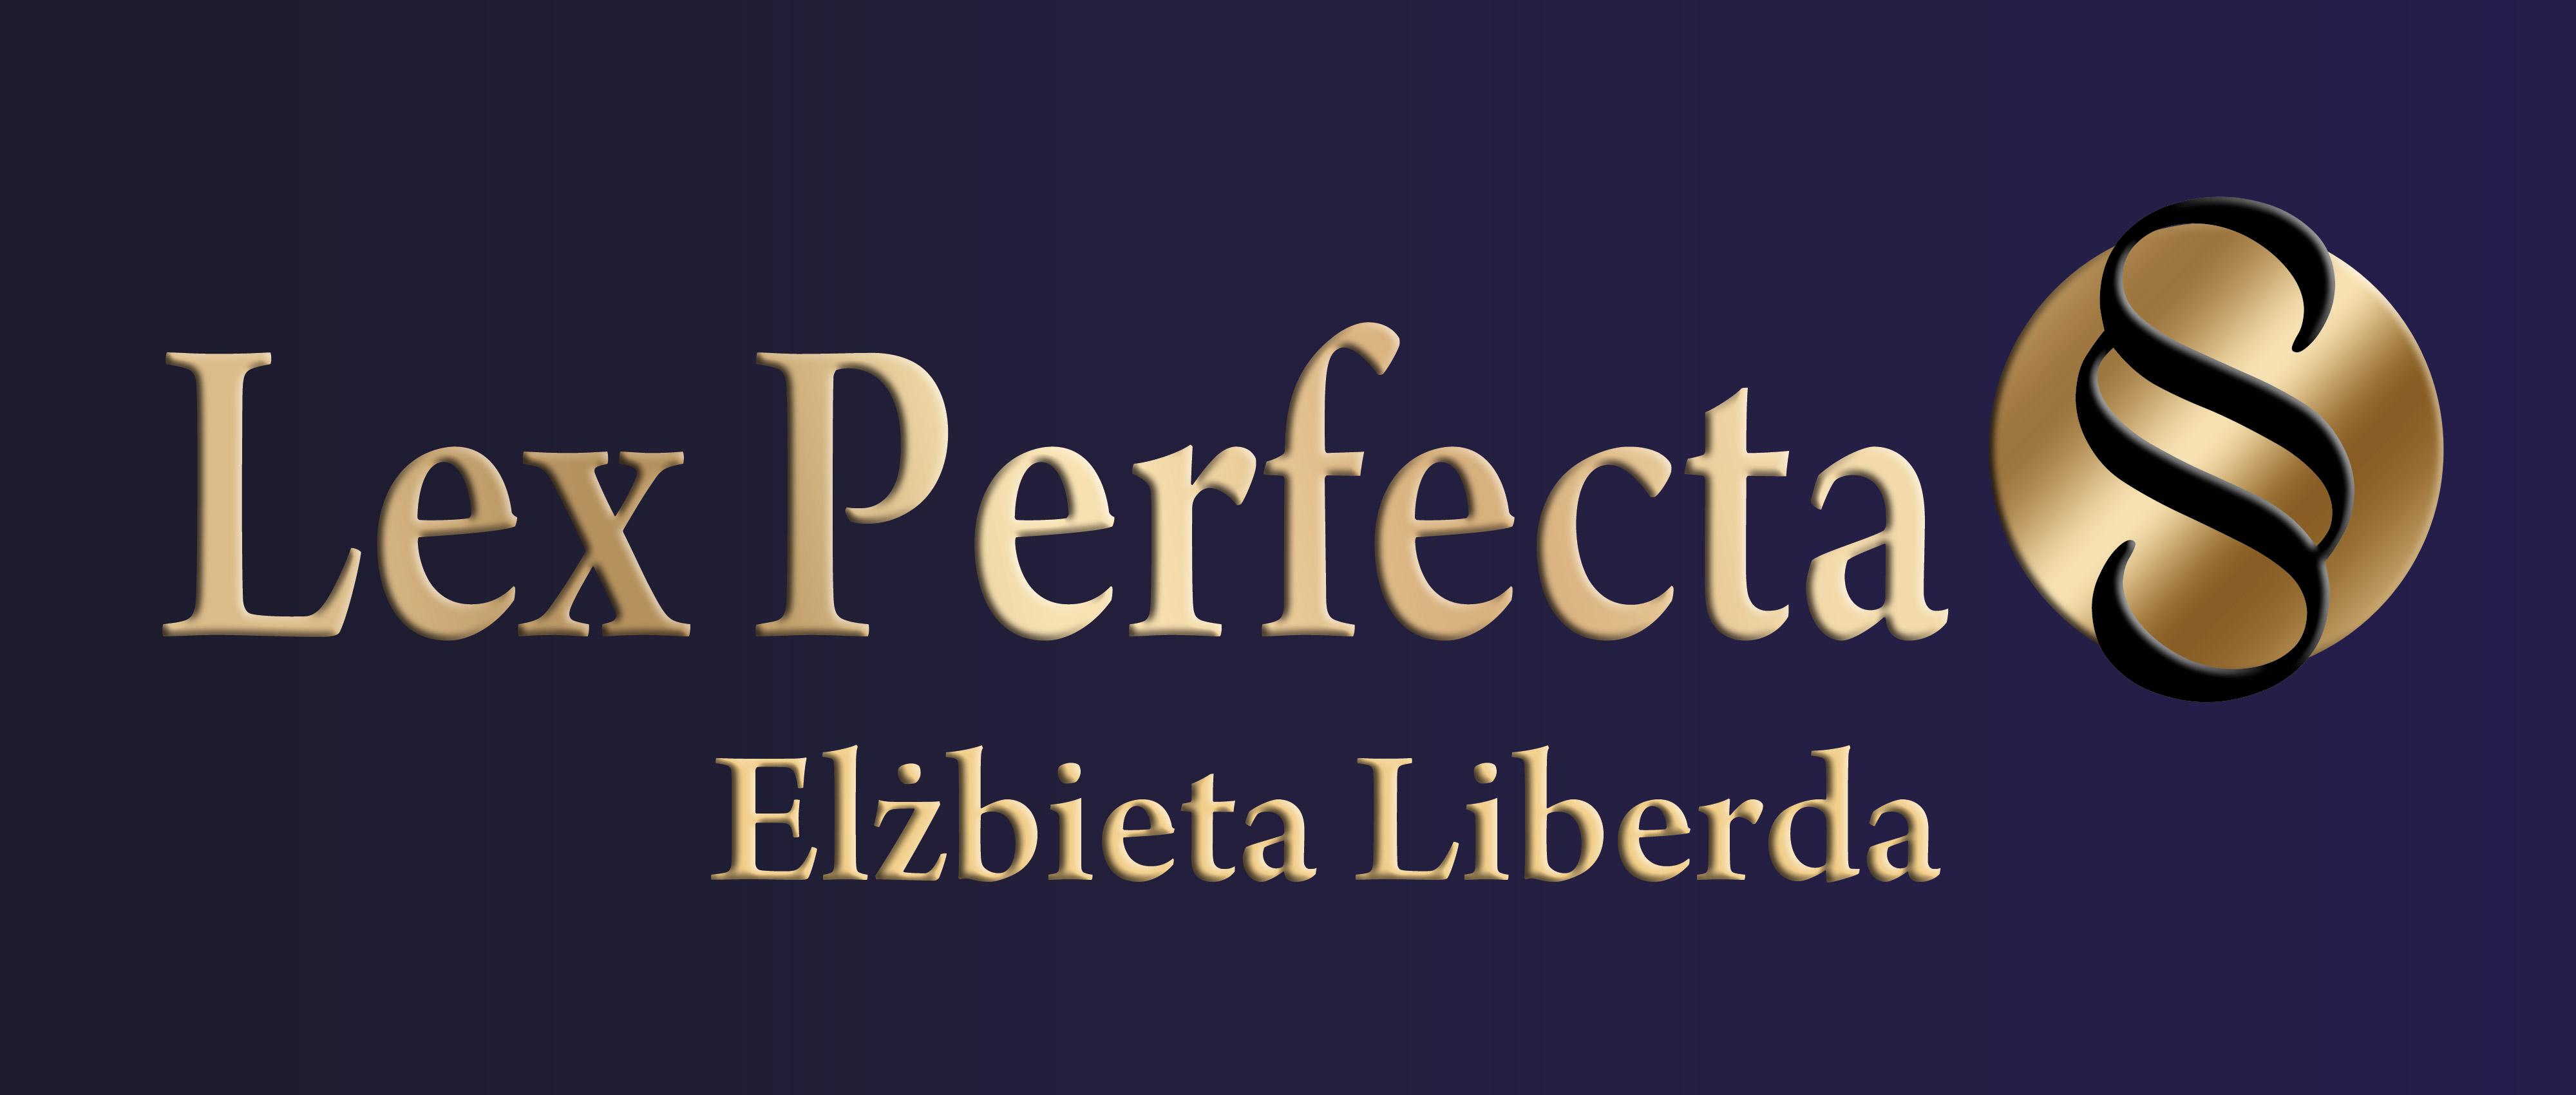 lexperfecta